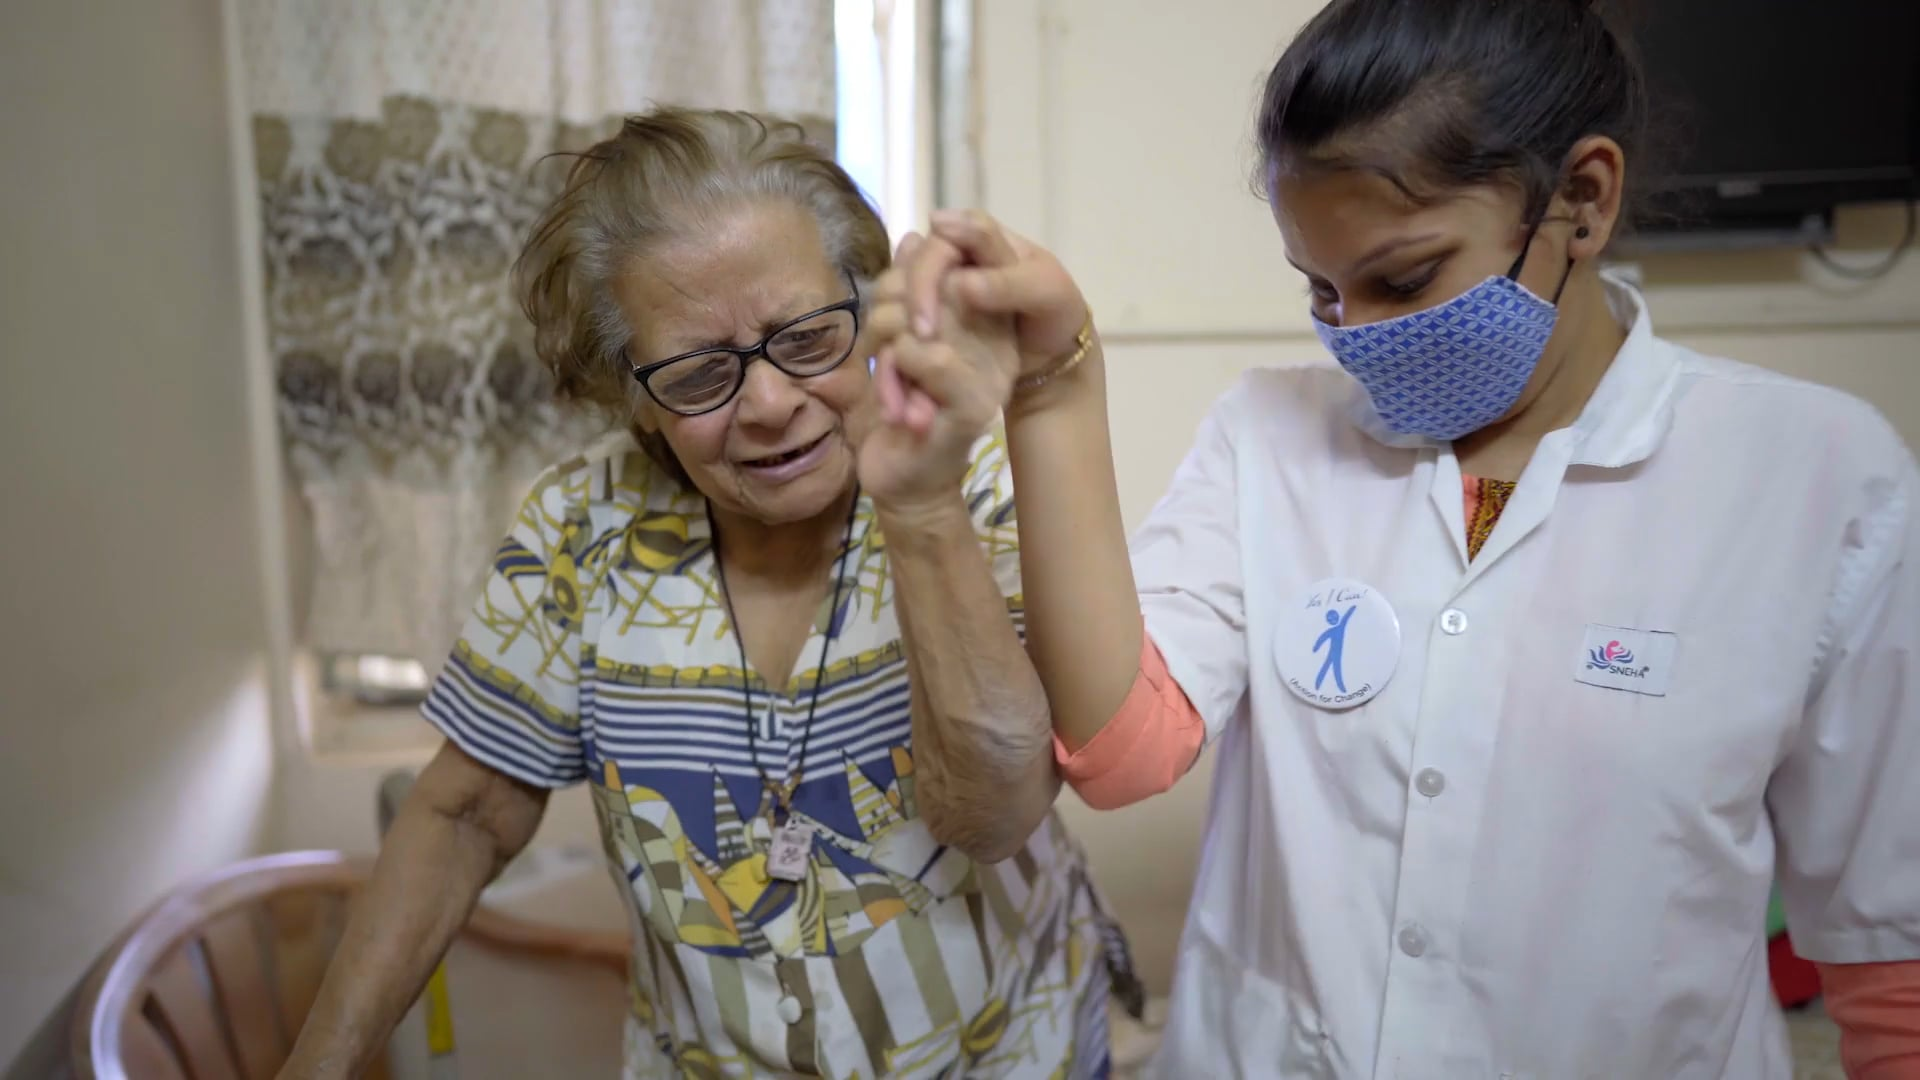 Geriatric Caregiving - Short Documentary - Yes I Can Foundation